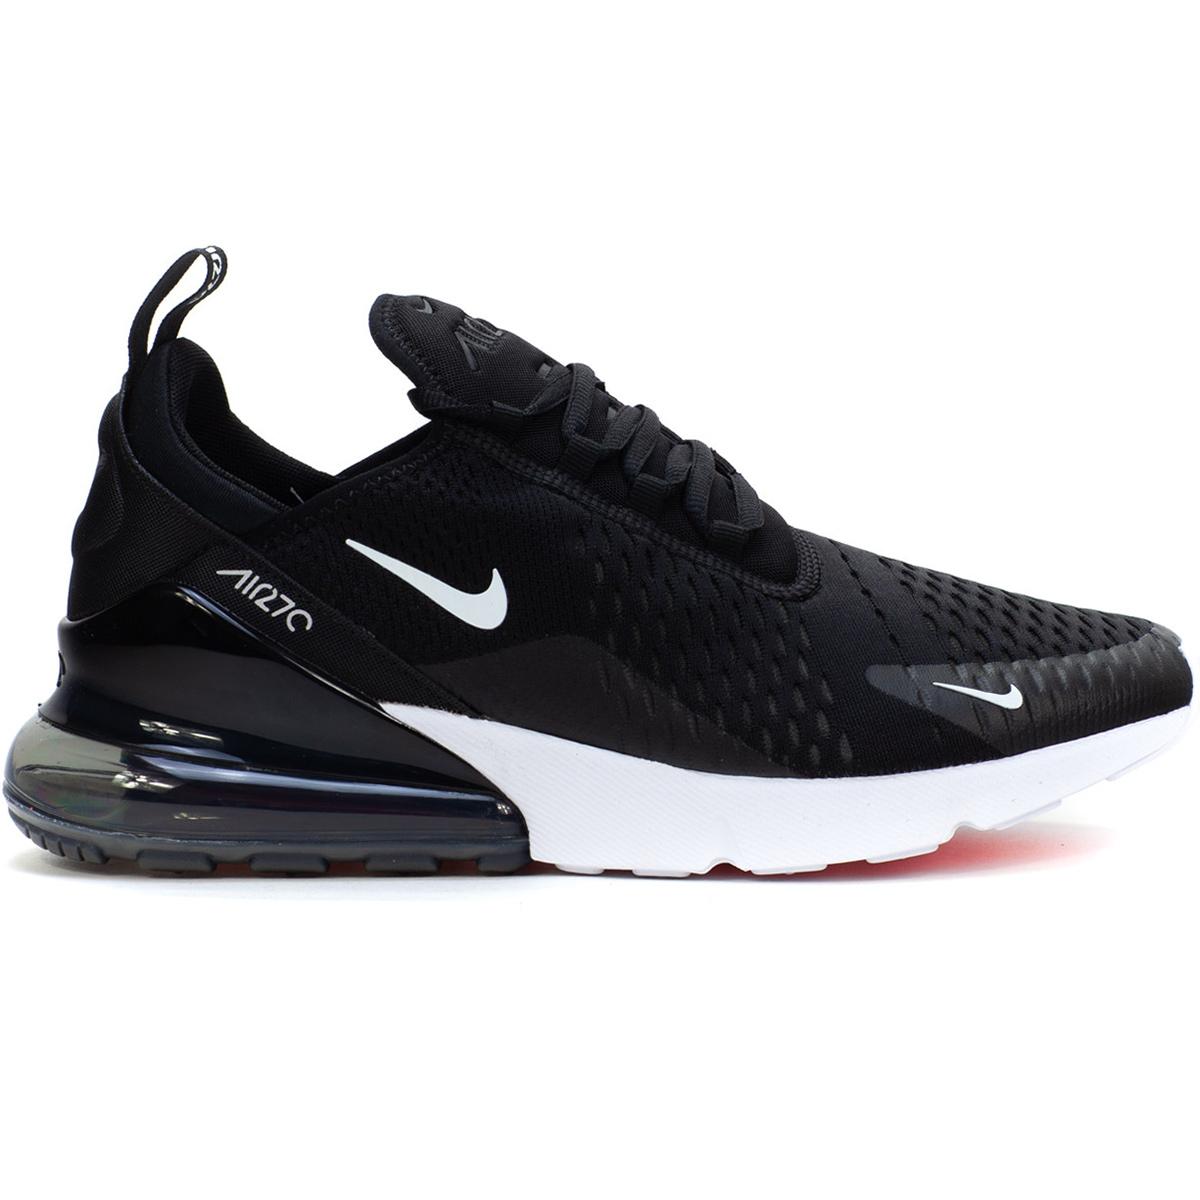 Nike Air Max 270 Herren Sneaker schwarz weiß AH8050 002